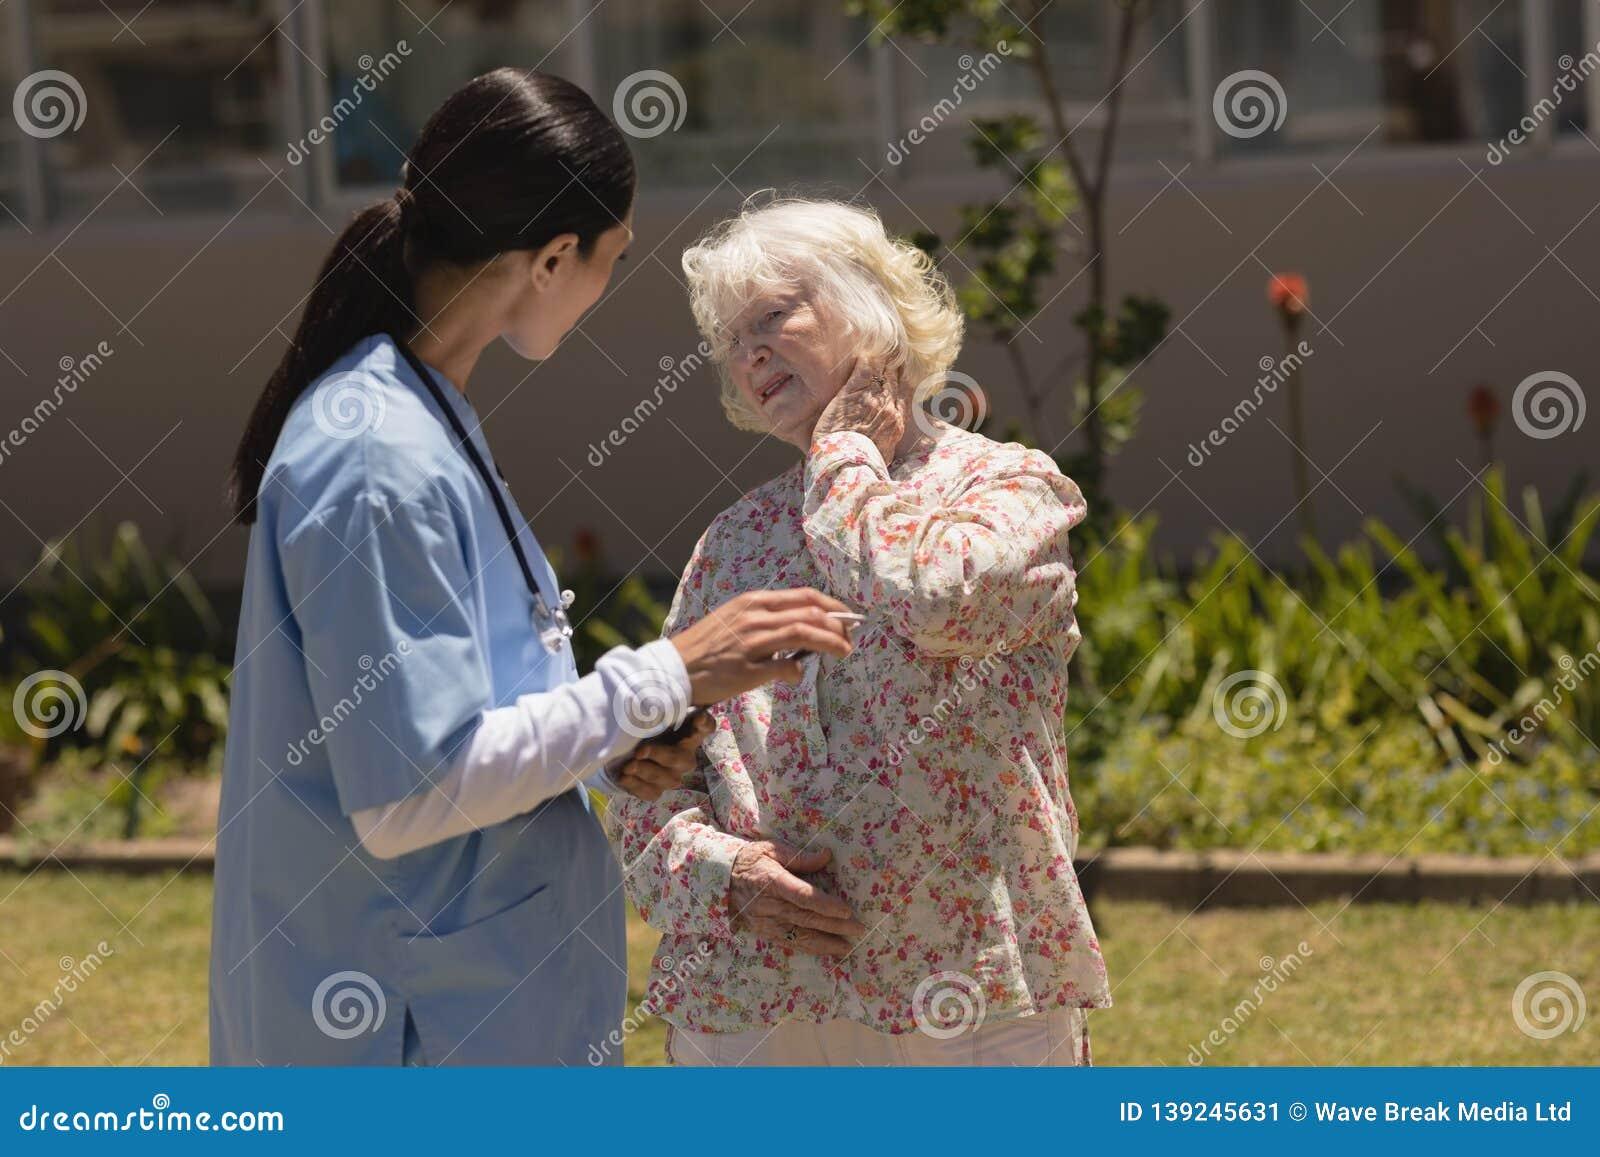 young female doctor examining senior woman in garden